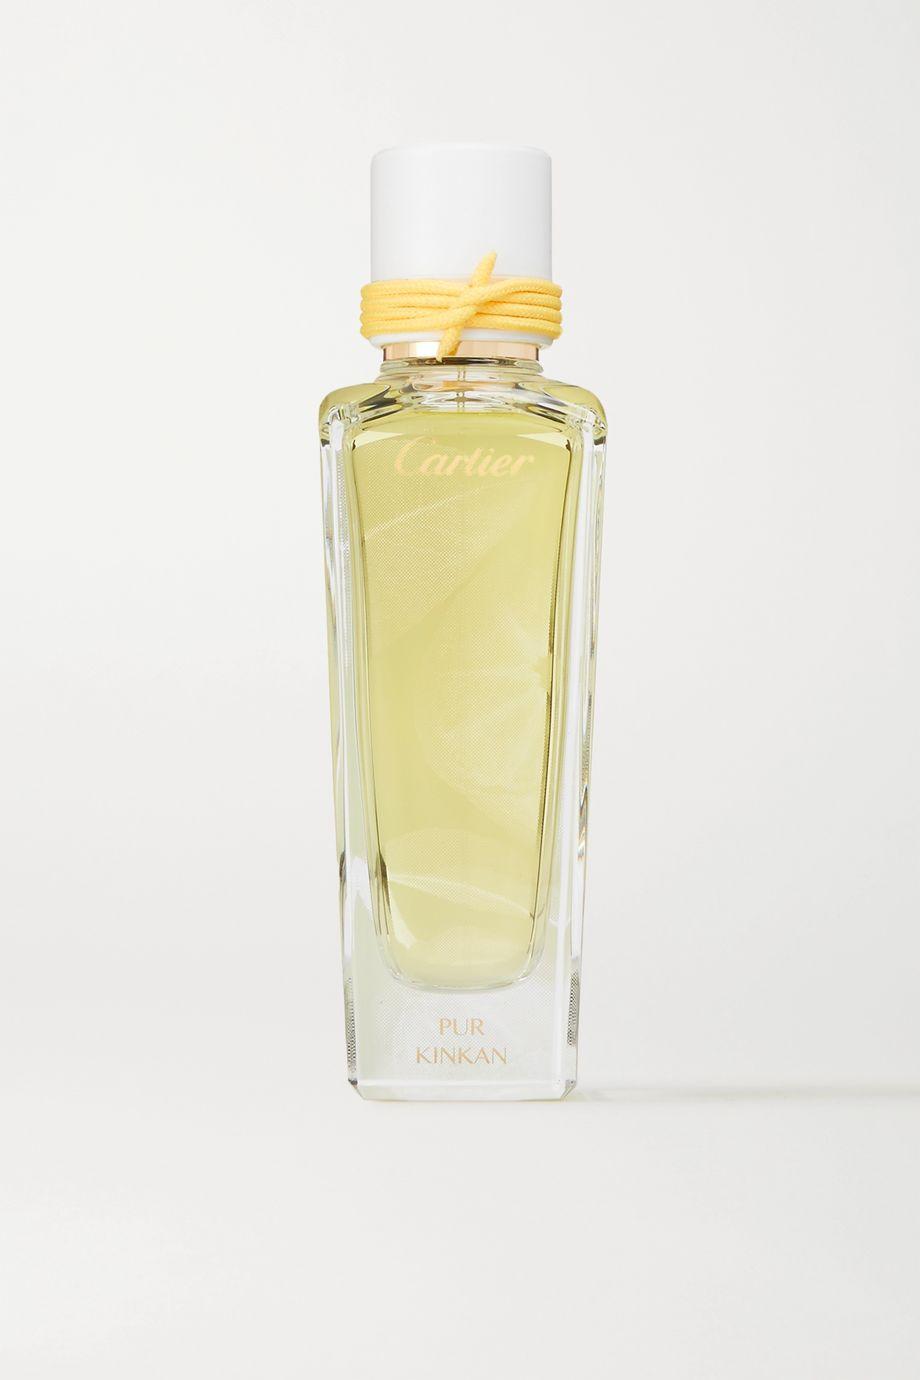 Cartier Perfumes Eau de Parfum - Pur Kinkan, 75ml